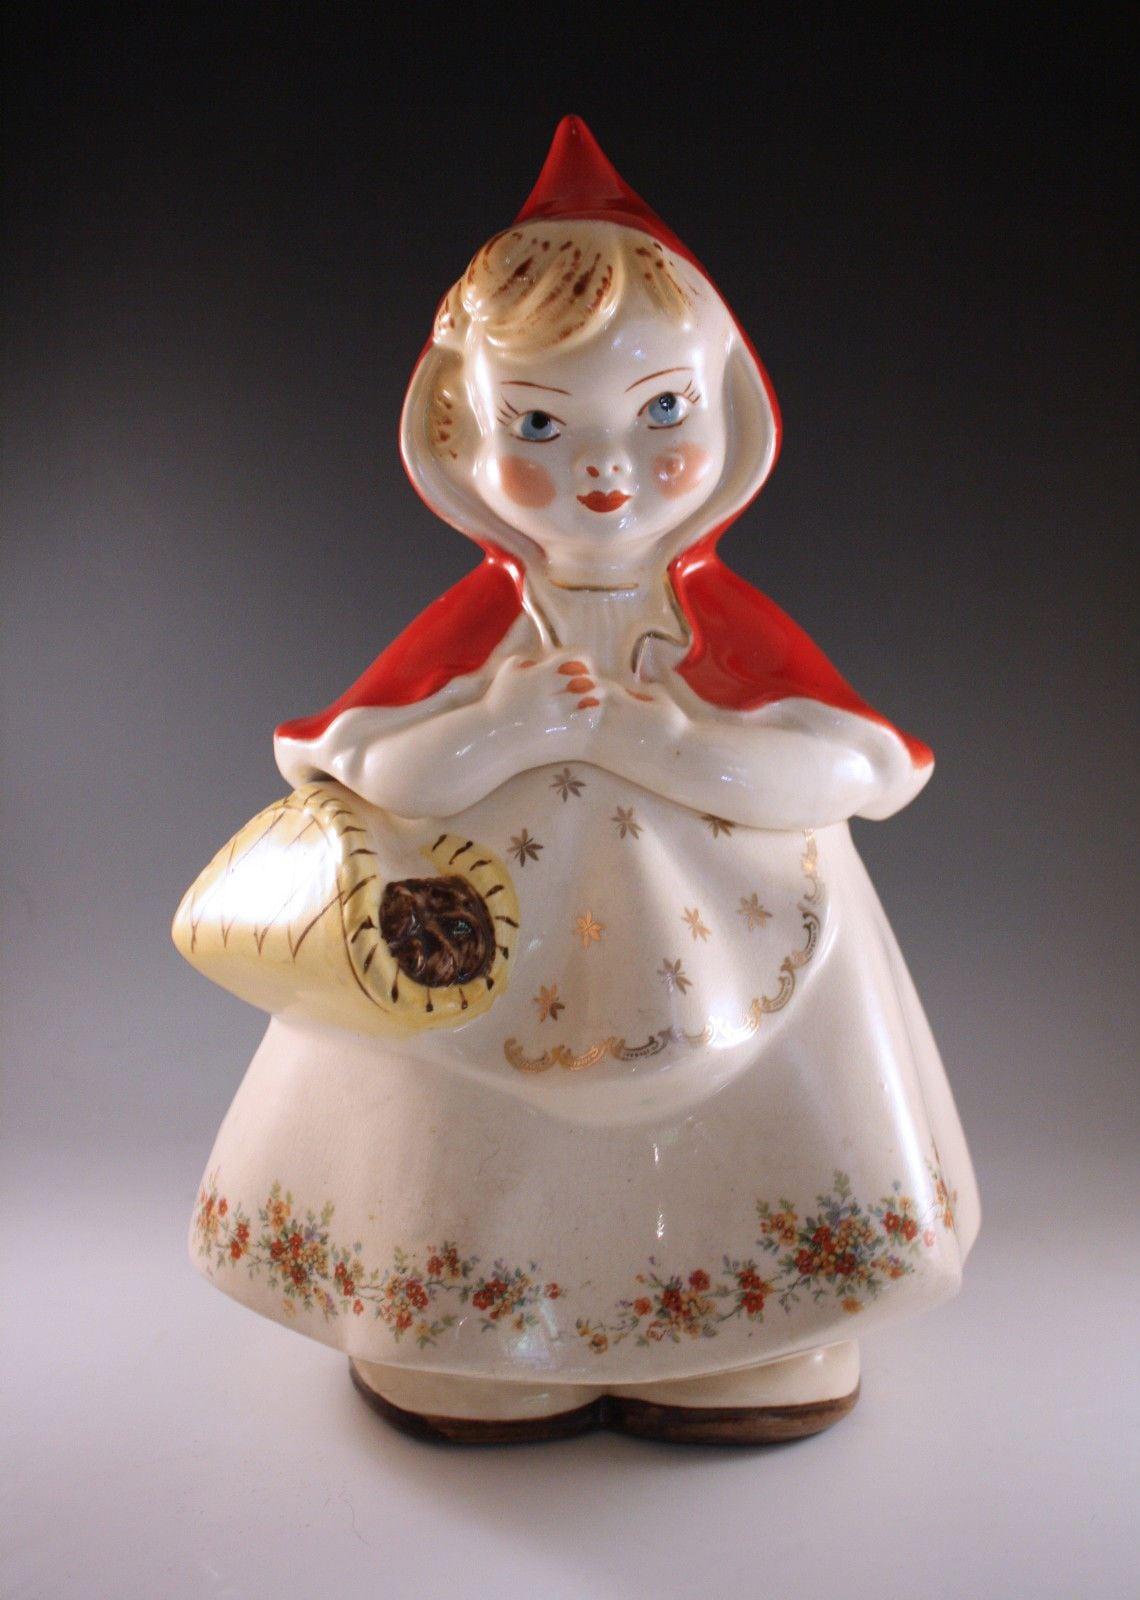 1940's Hull Original Little Red Riding Hood Cookie Jar,  967